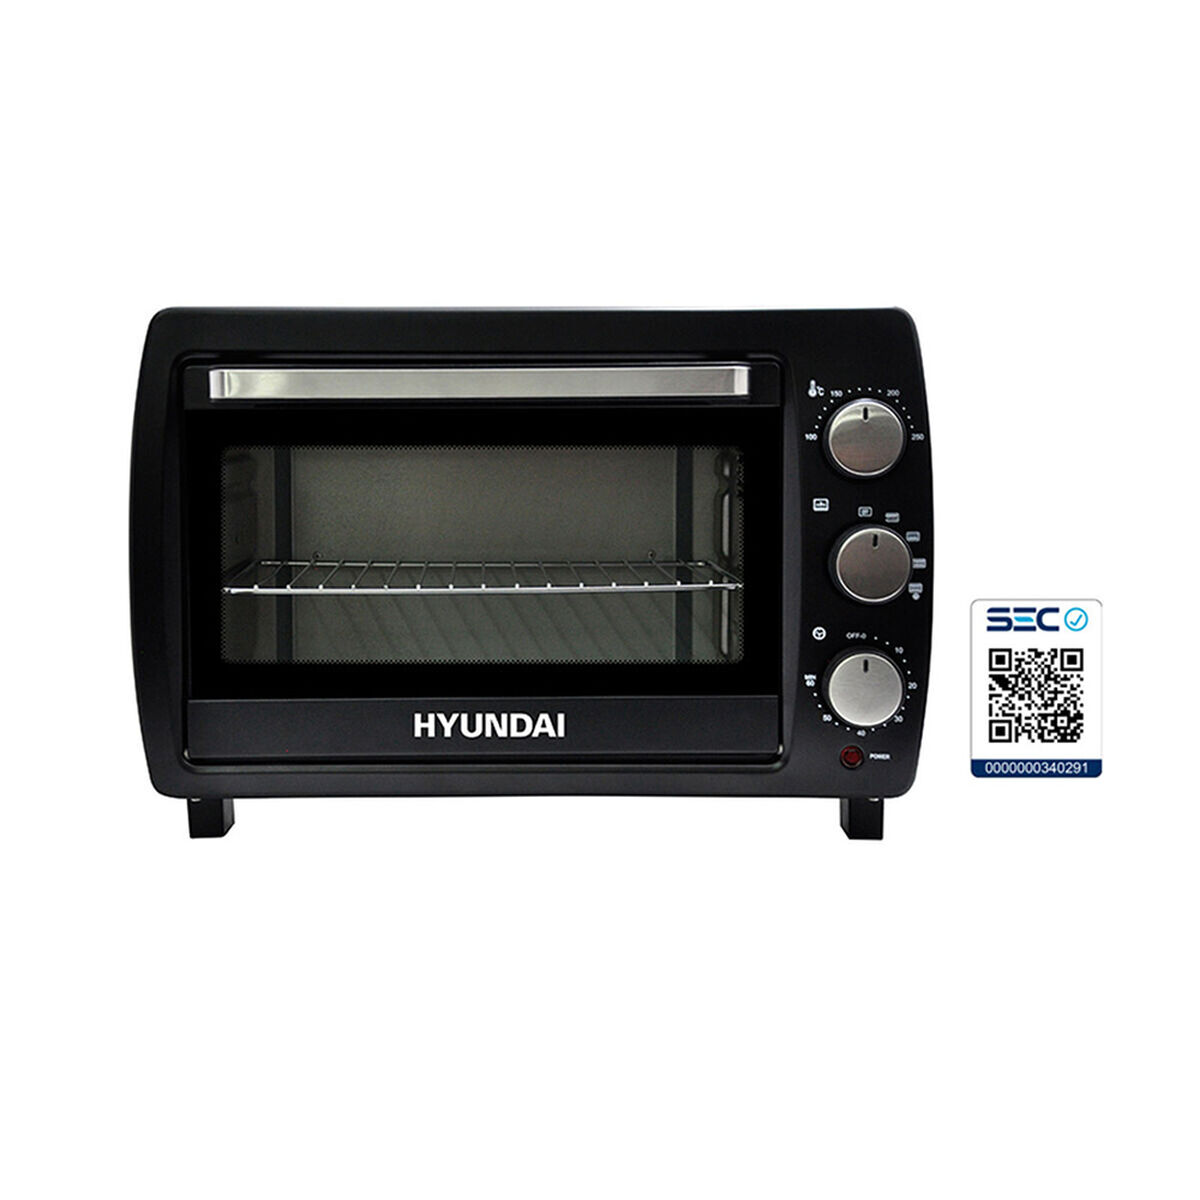 Combo Horno Eléctrico Hyundai HY28N 28 lt. + Mueble de Cocina Casanova 1 Puerta Nature / Blanco